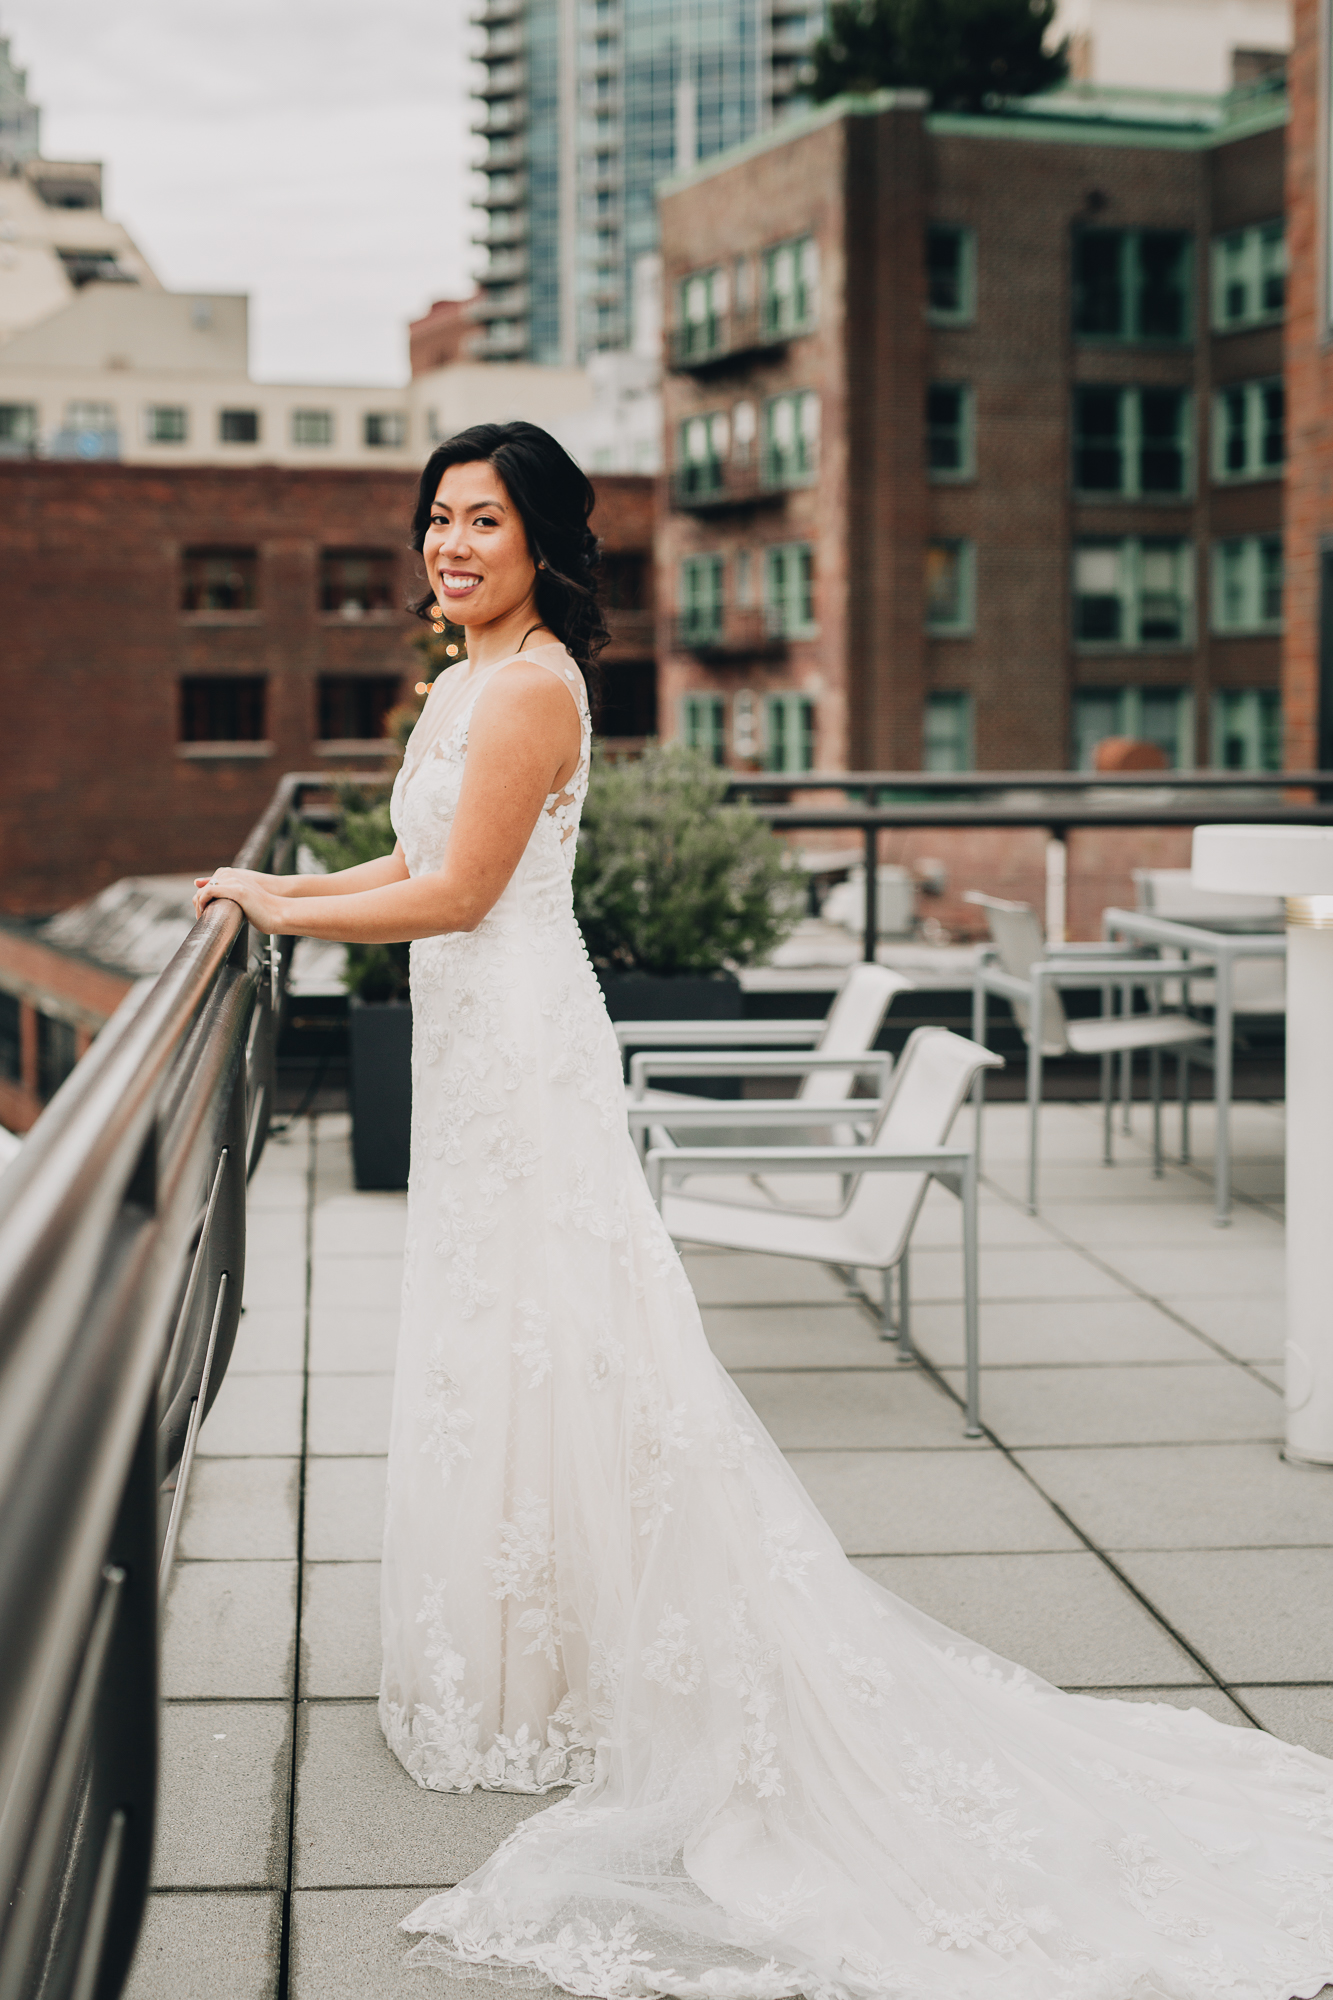 Seattle courthouse wedding photos kristawelch36.jpg